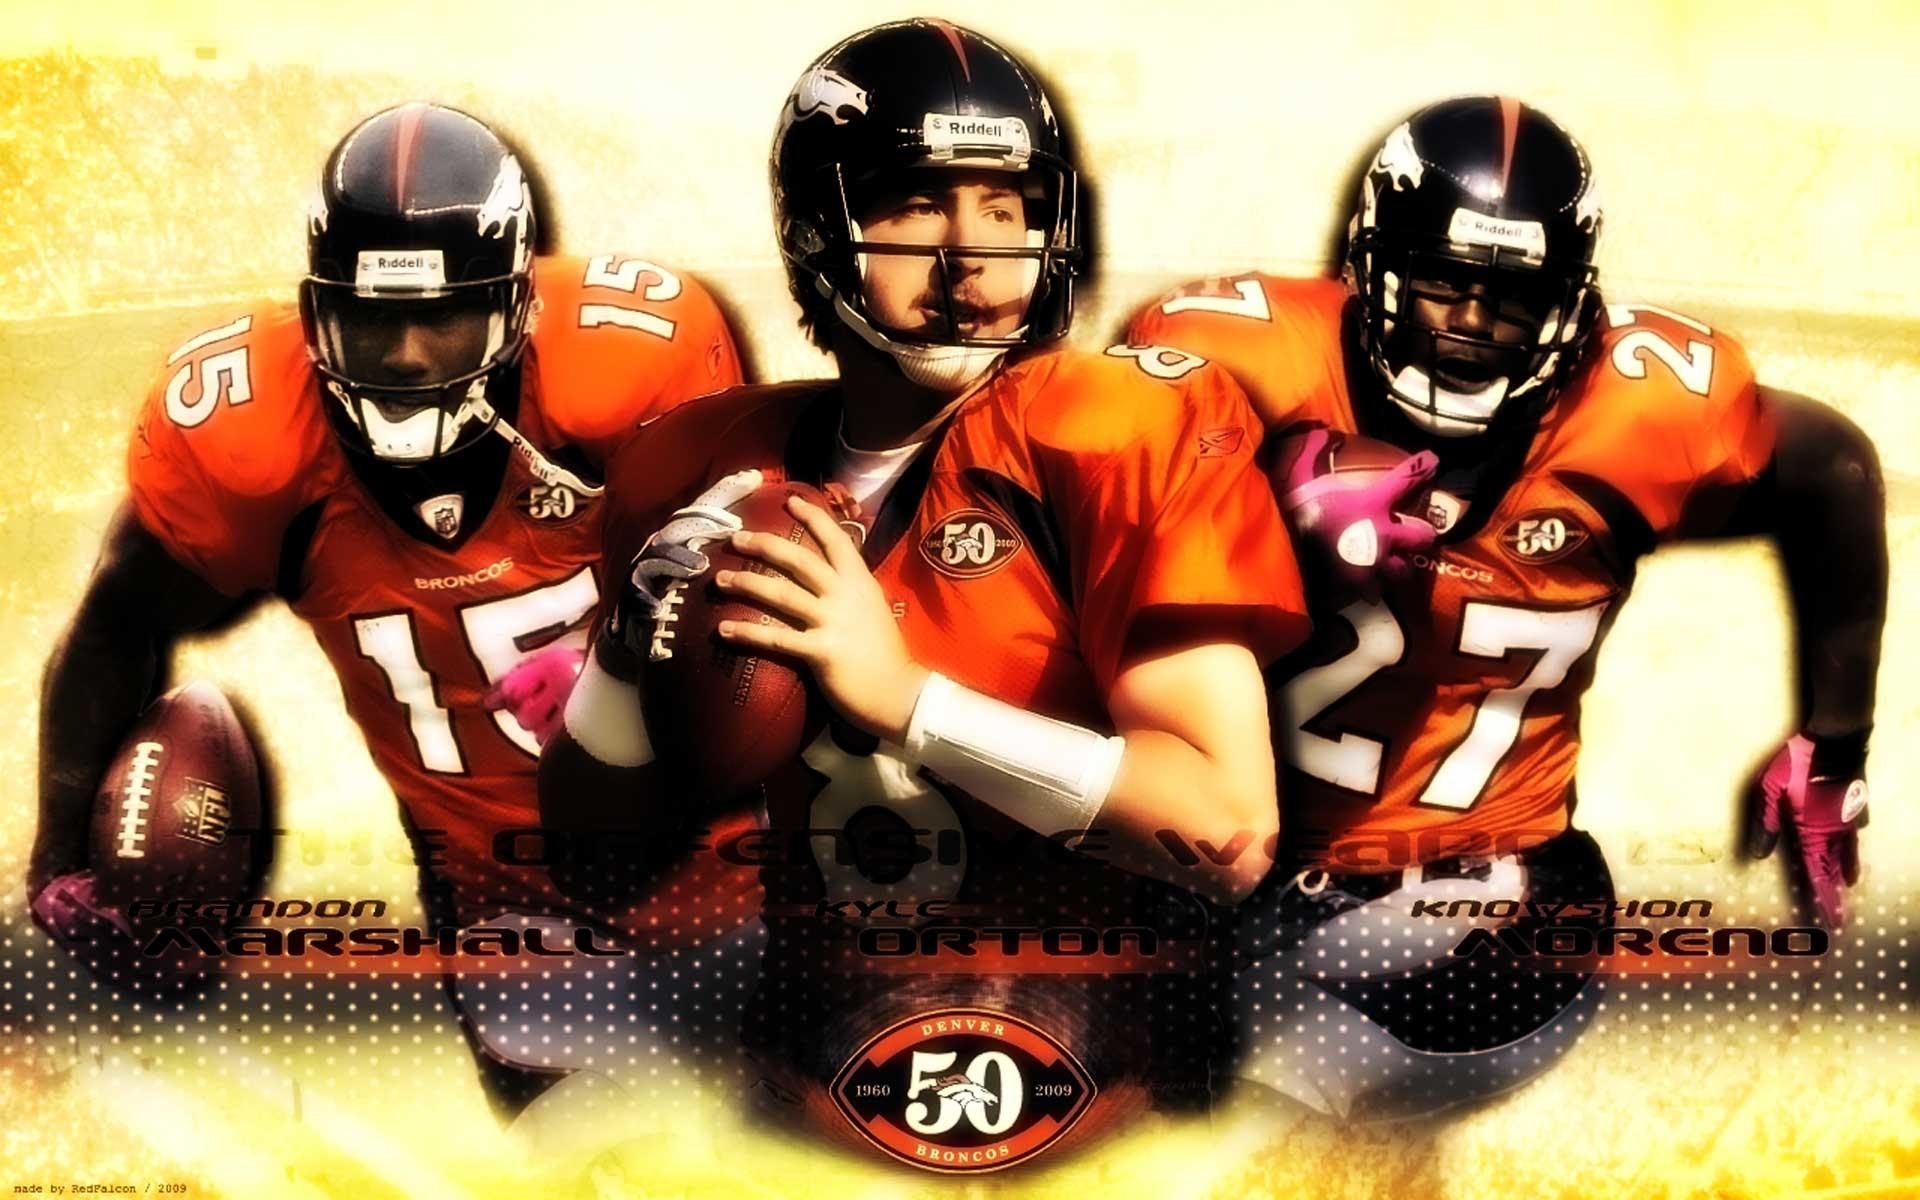 Free wallpaper of Denver broncos for IPad | Denver Broncos wallpaper HD  images | Denver Broncos